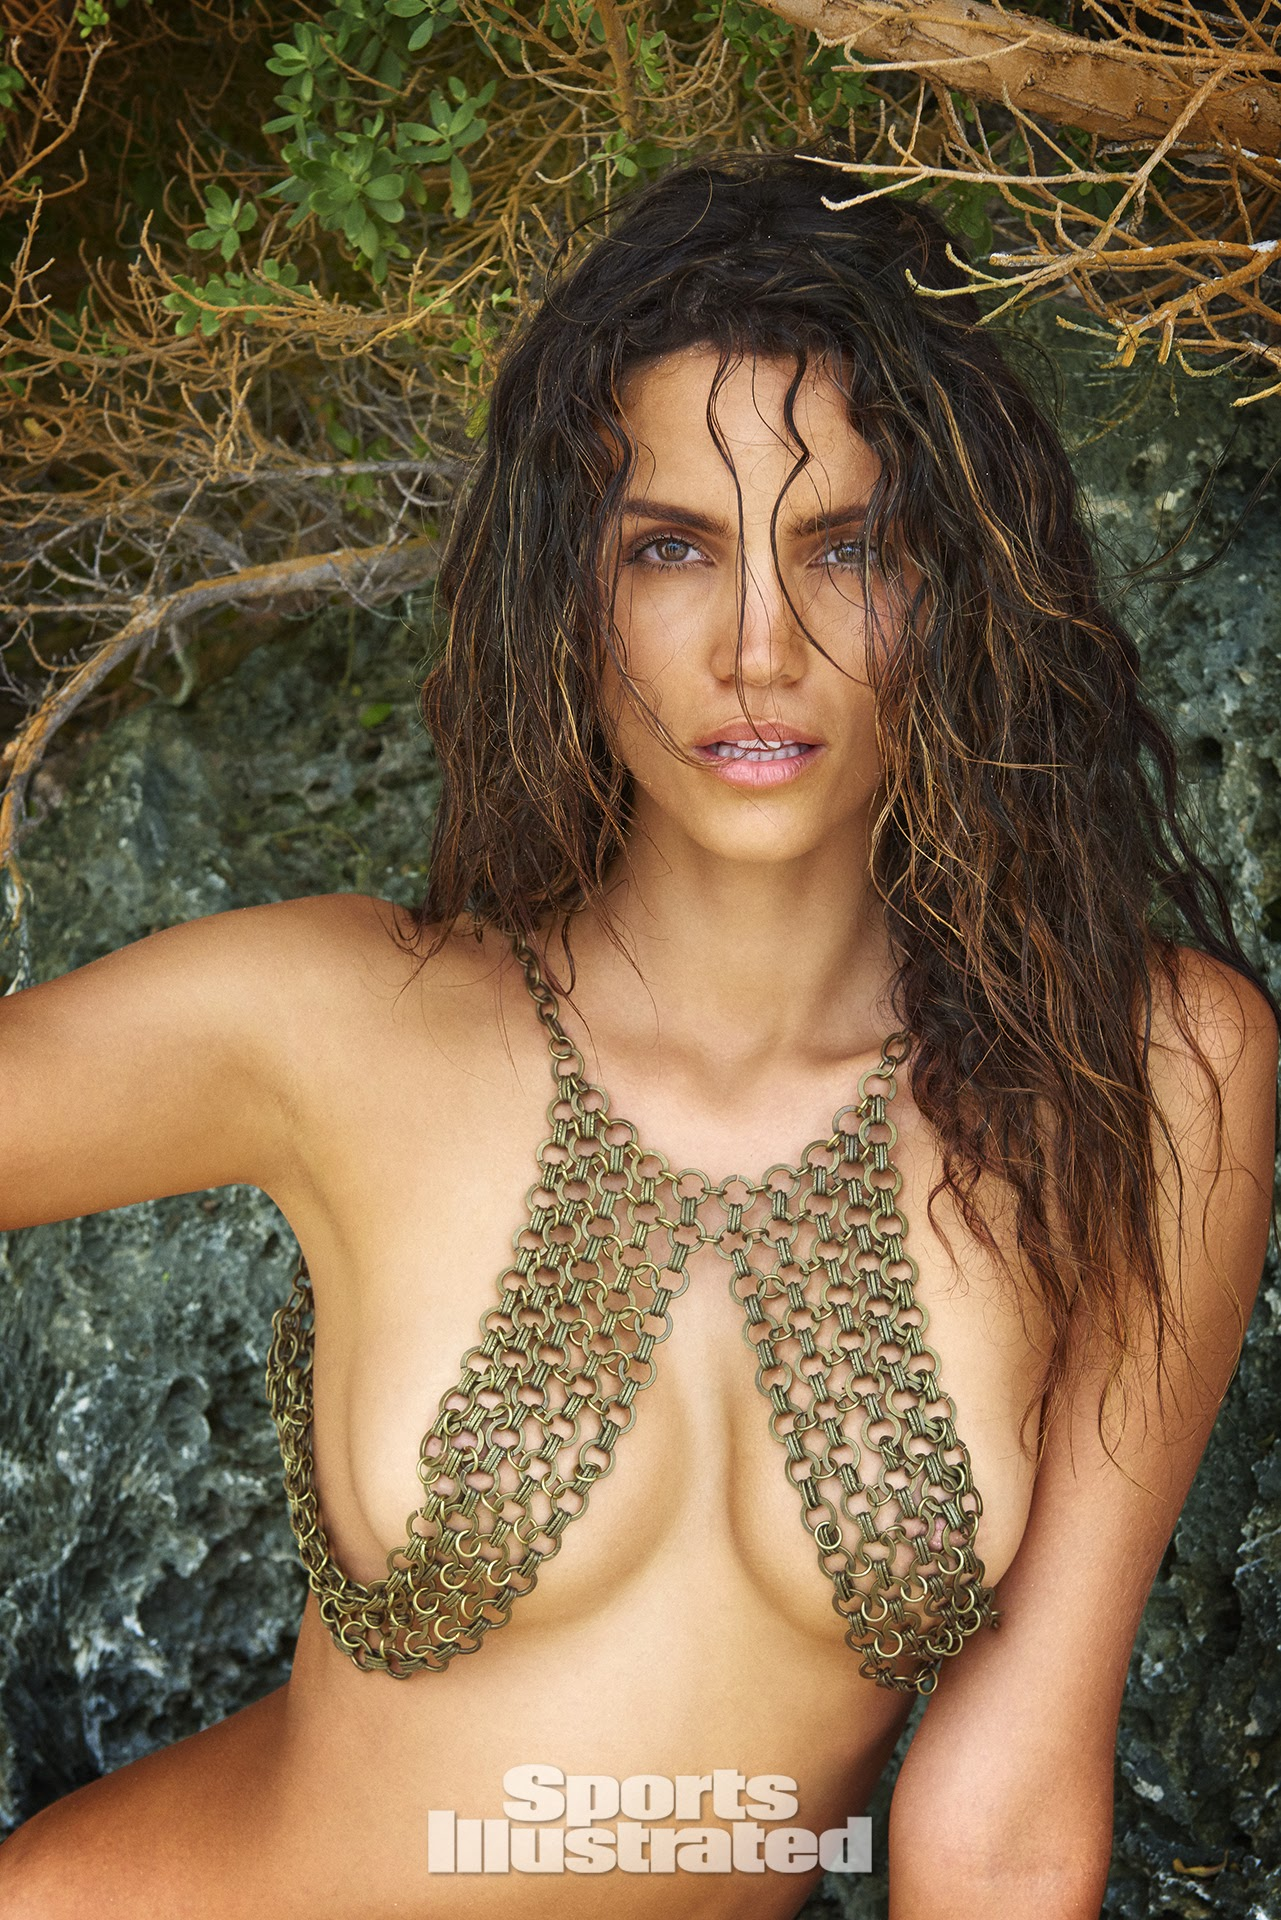 Sofia Vergara: Sofia Vergara cleavage pics